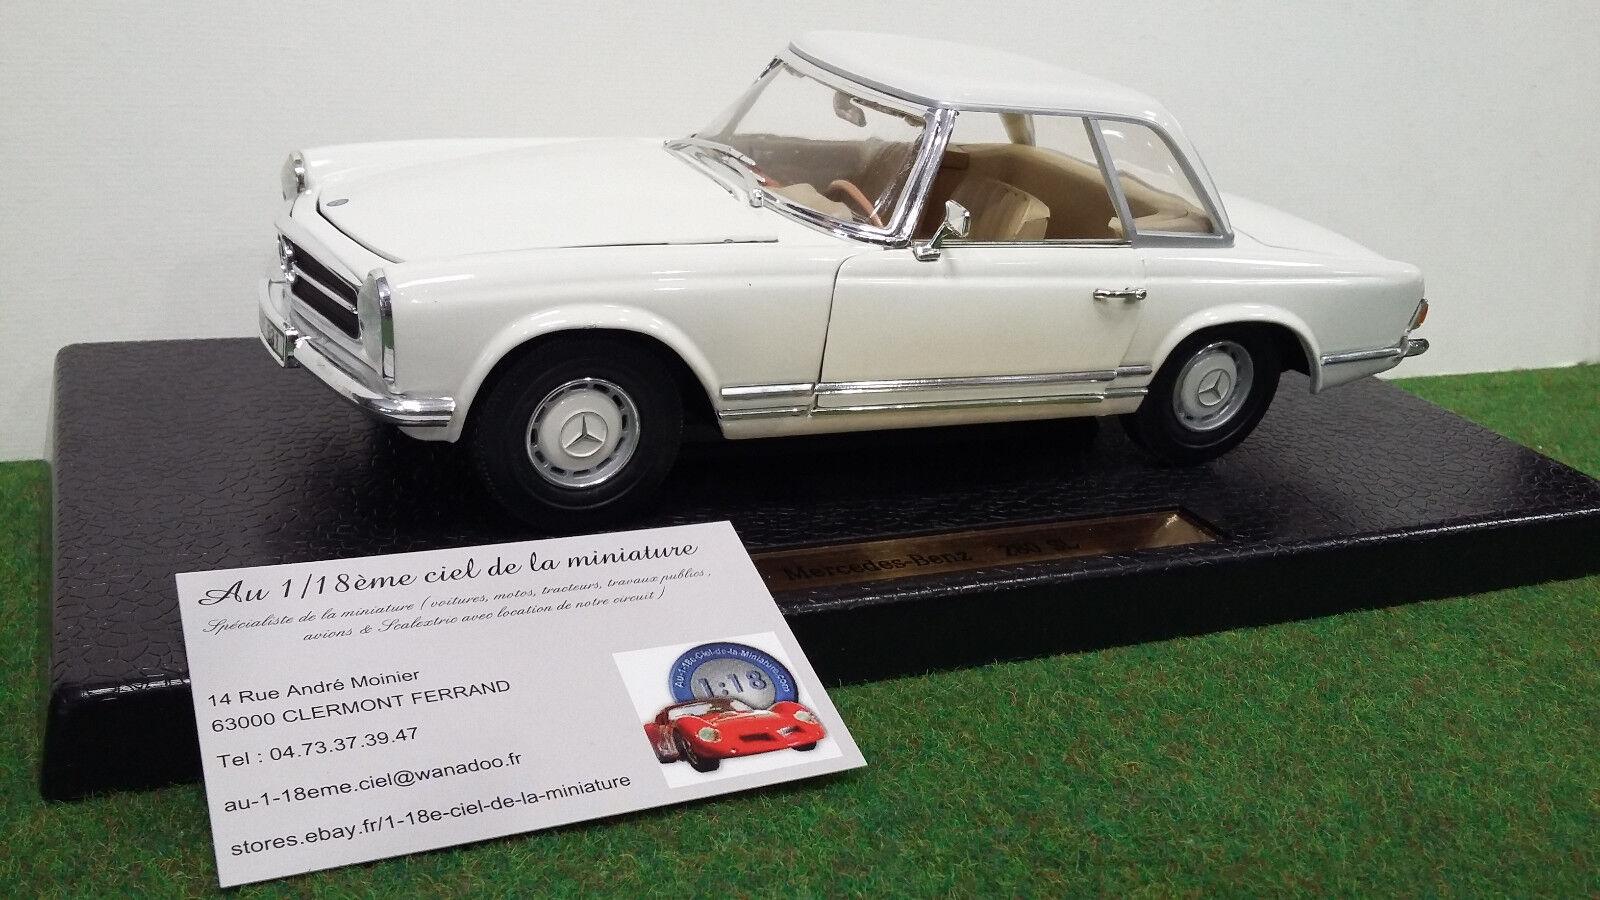 MERCEDES  BENZ 280 SL cabriolet HT 1 18 ANSON 30380 voiture miniature collection